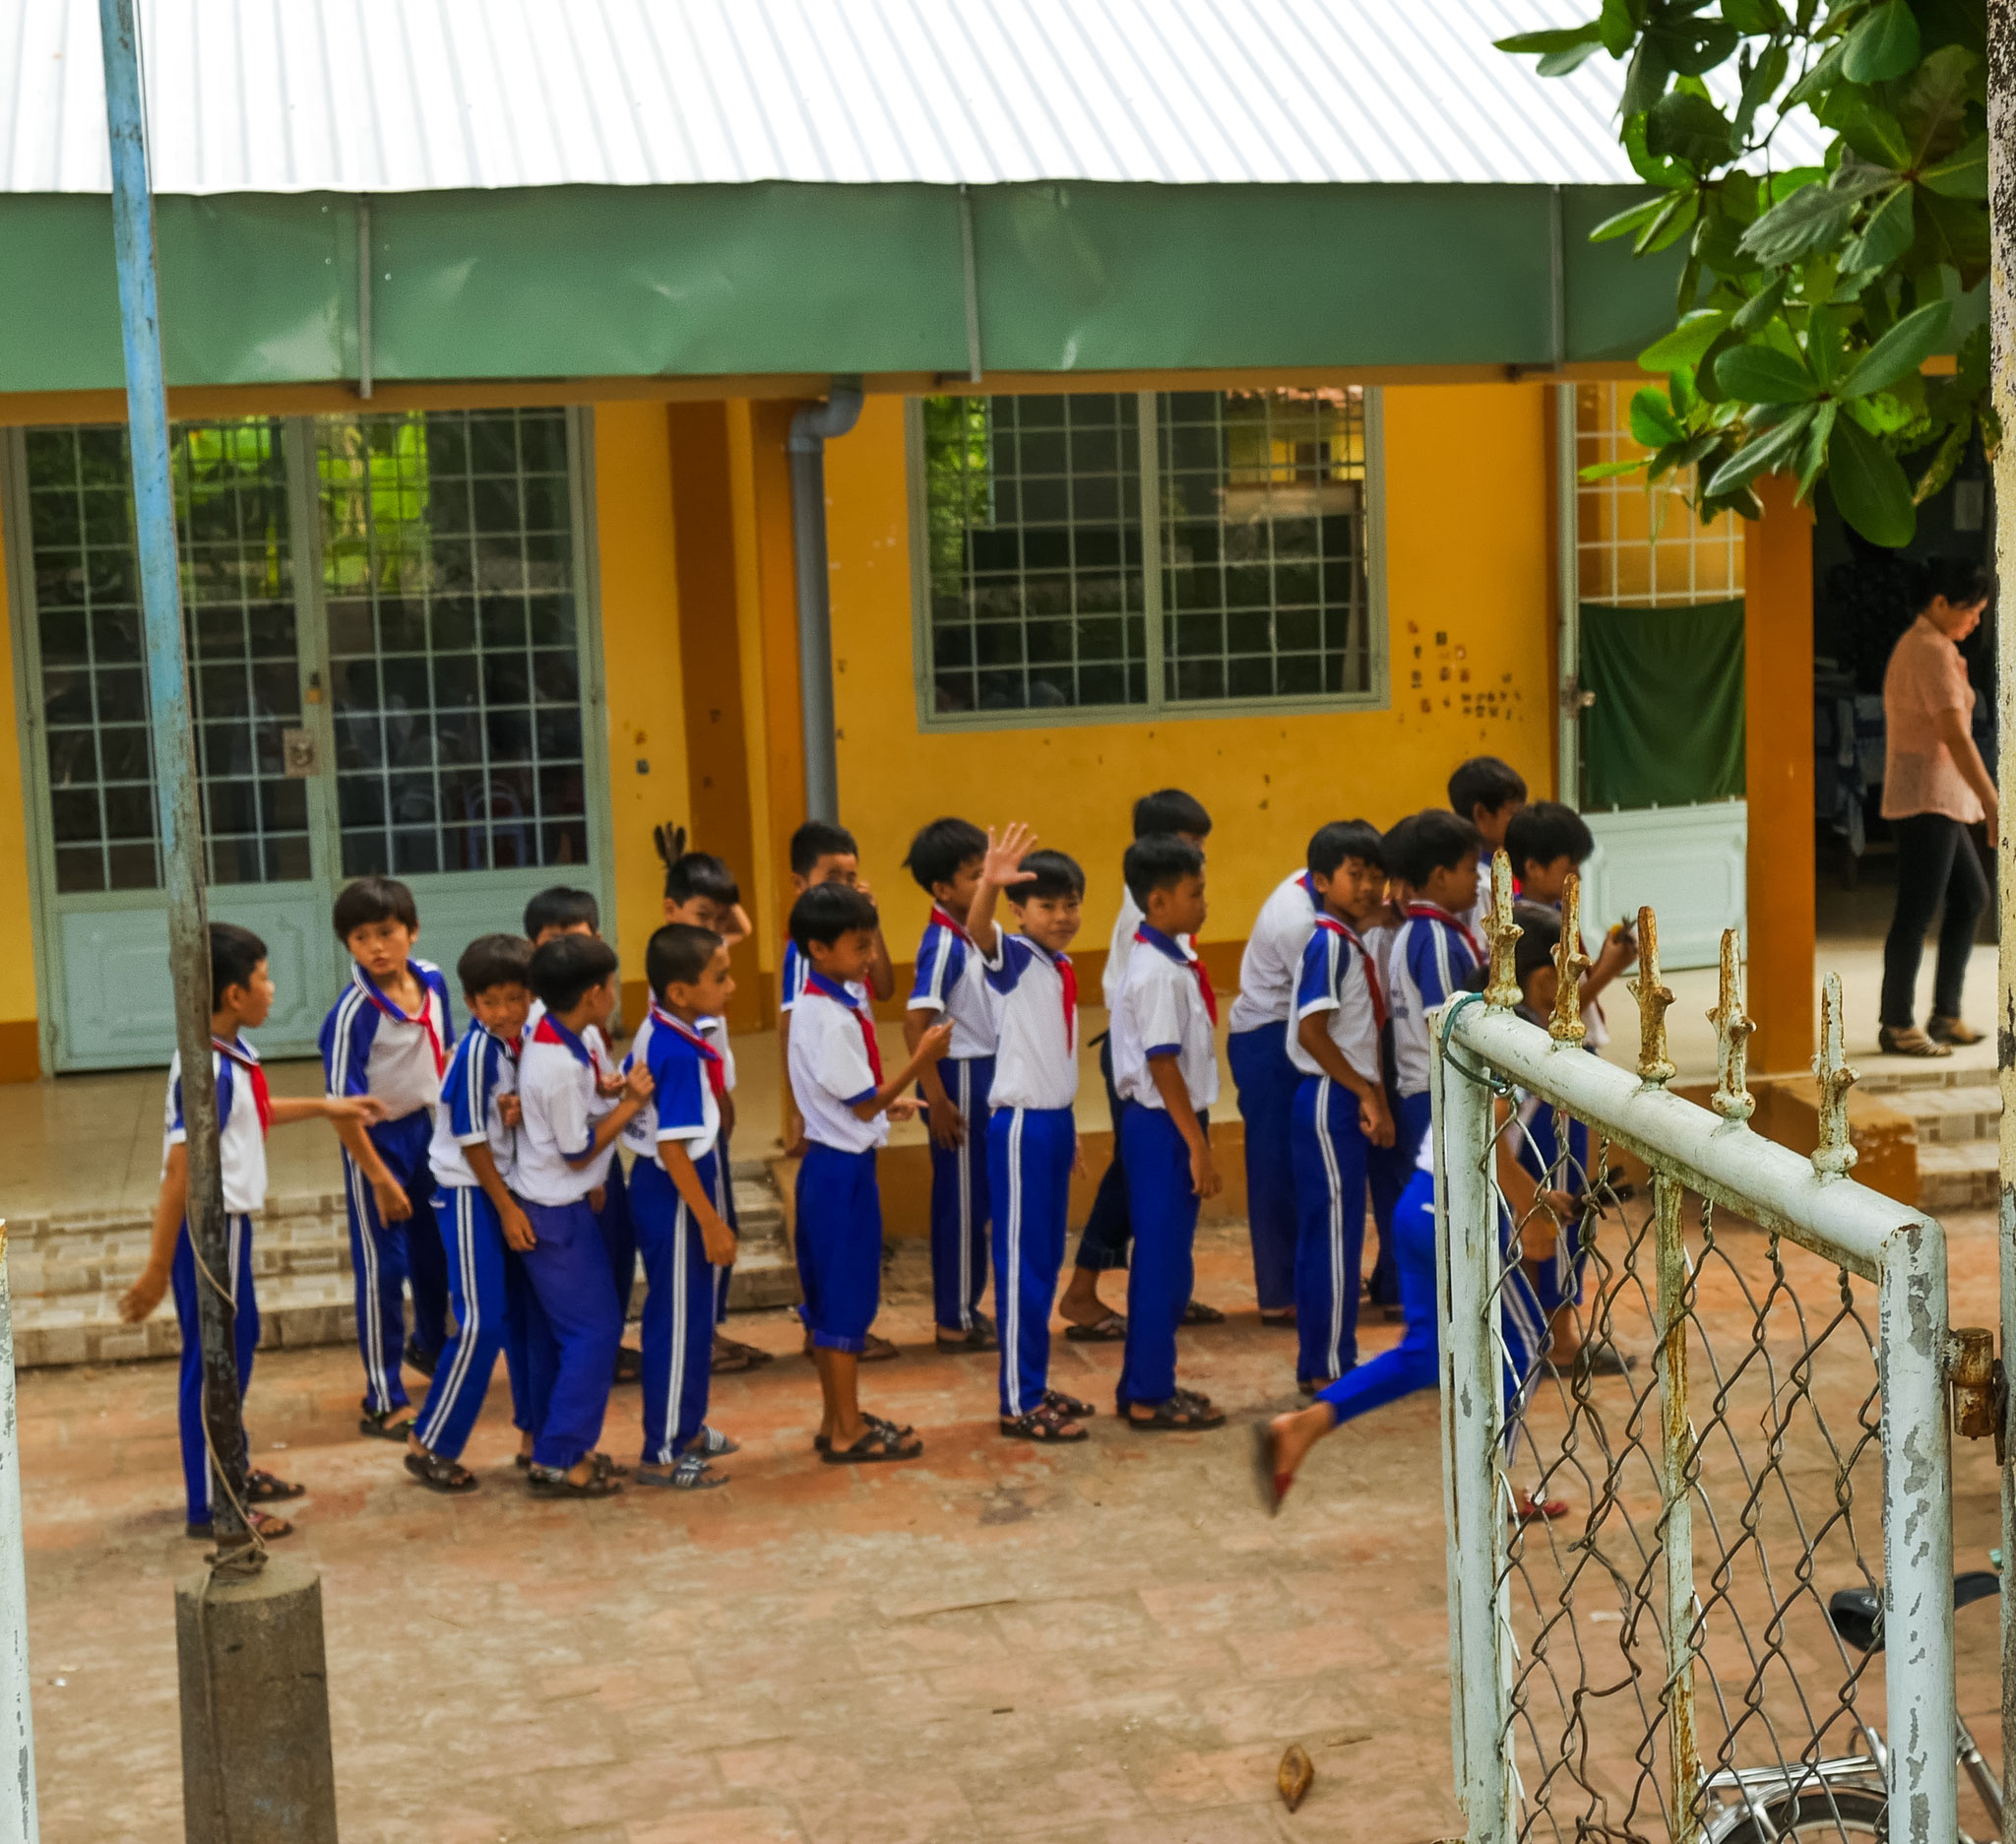 unterwegs im Mekong Delta